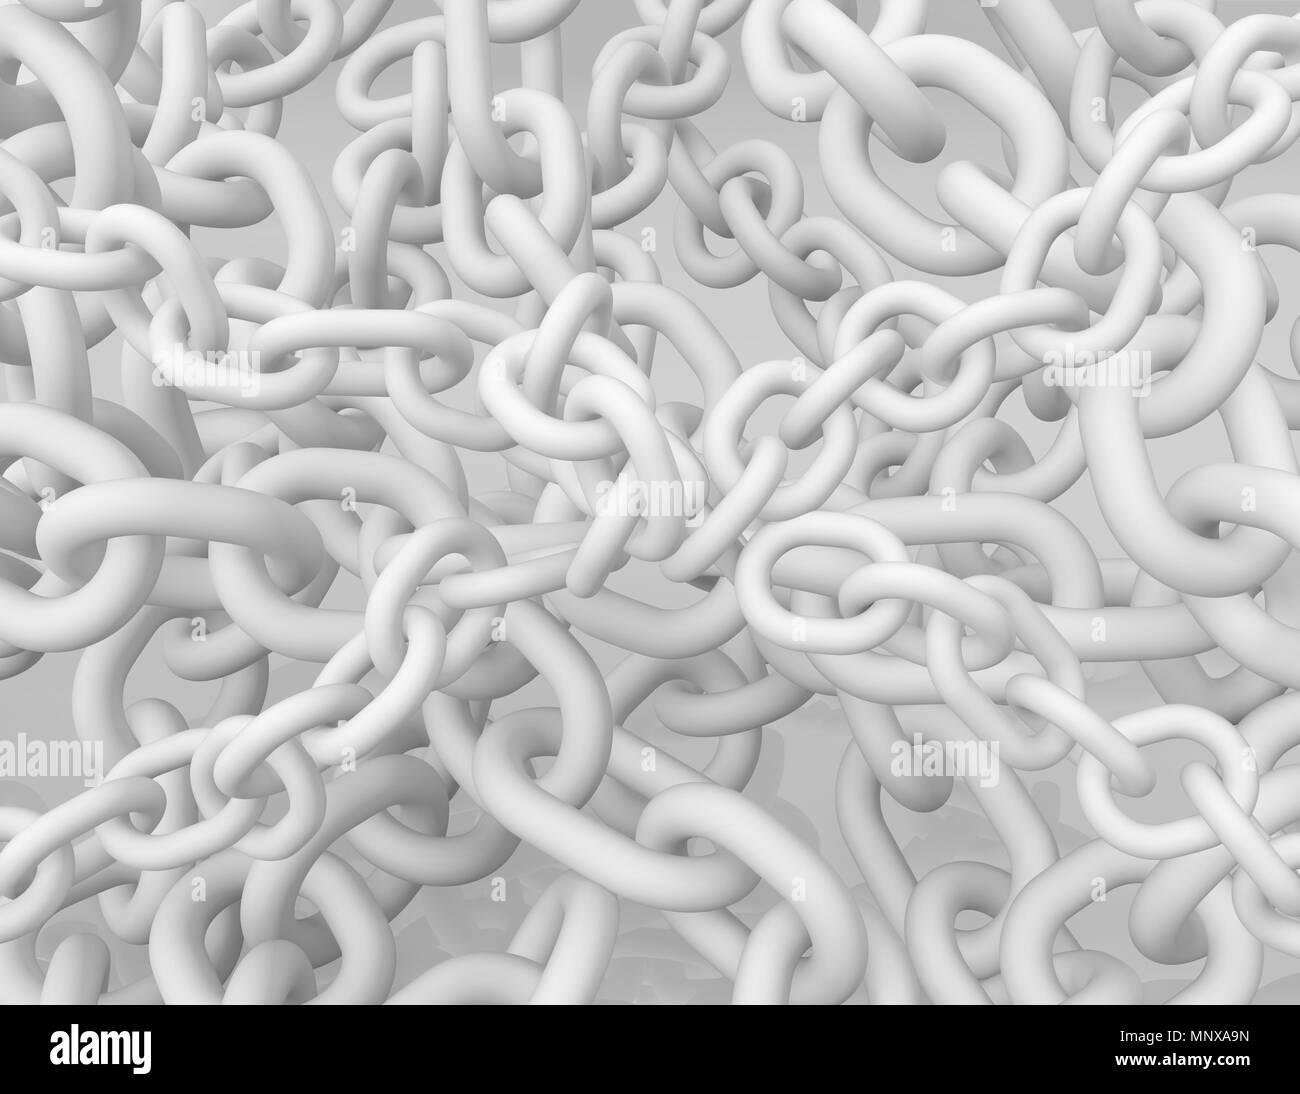 White chains many, 3d illustration, horizontal background - Stock Image